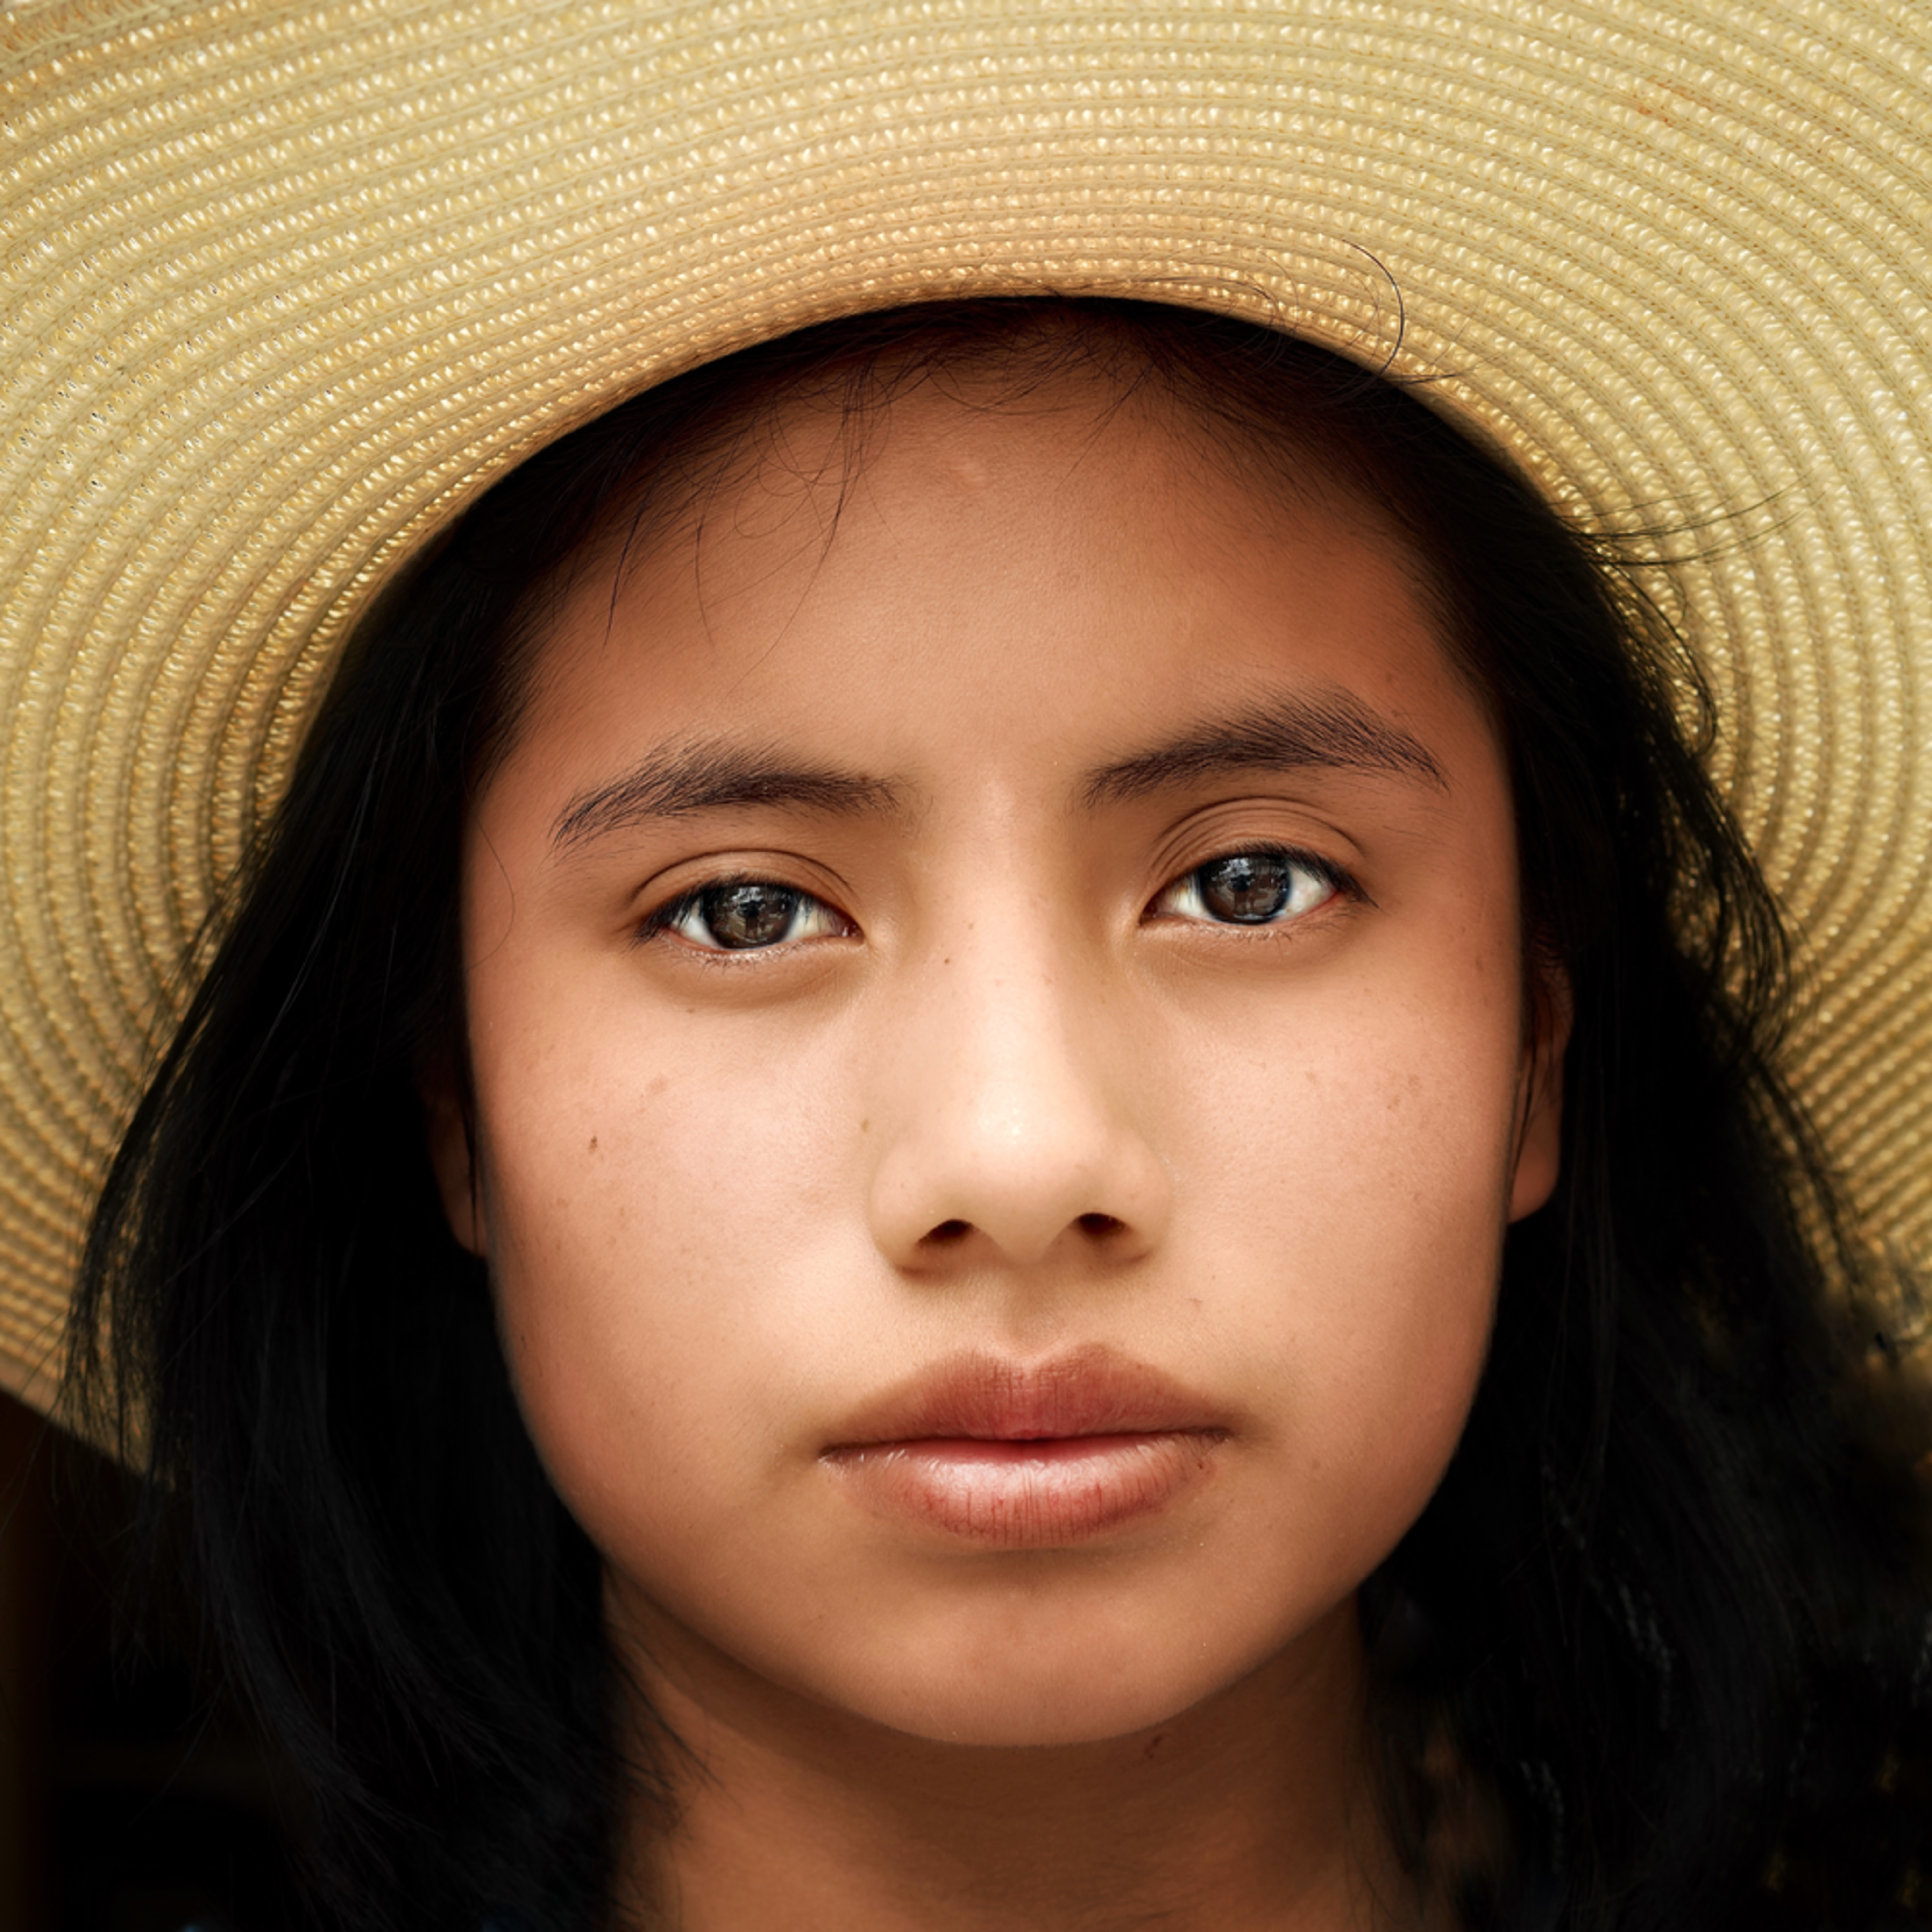 Oaxacan girl fibxx9